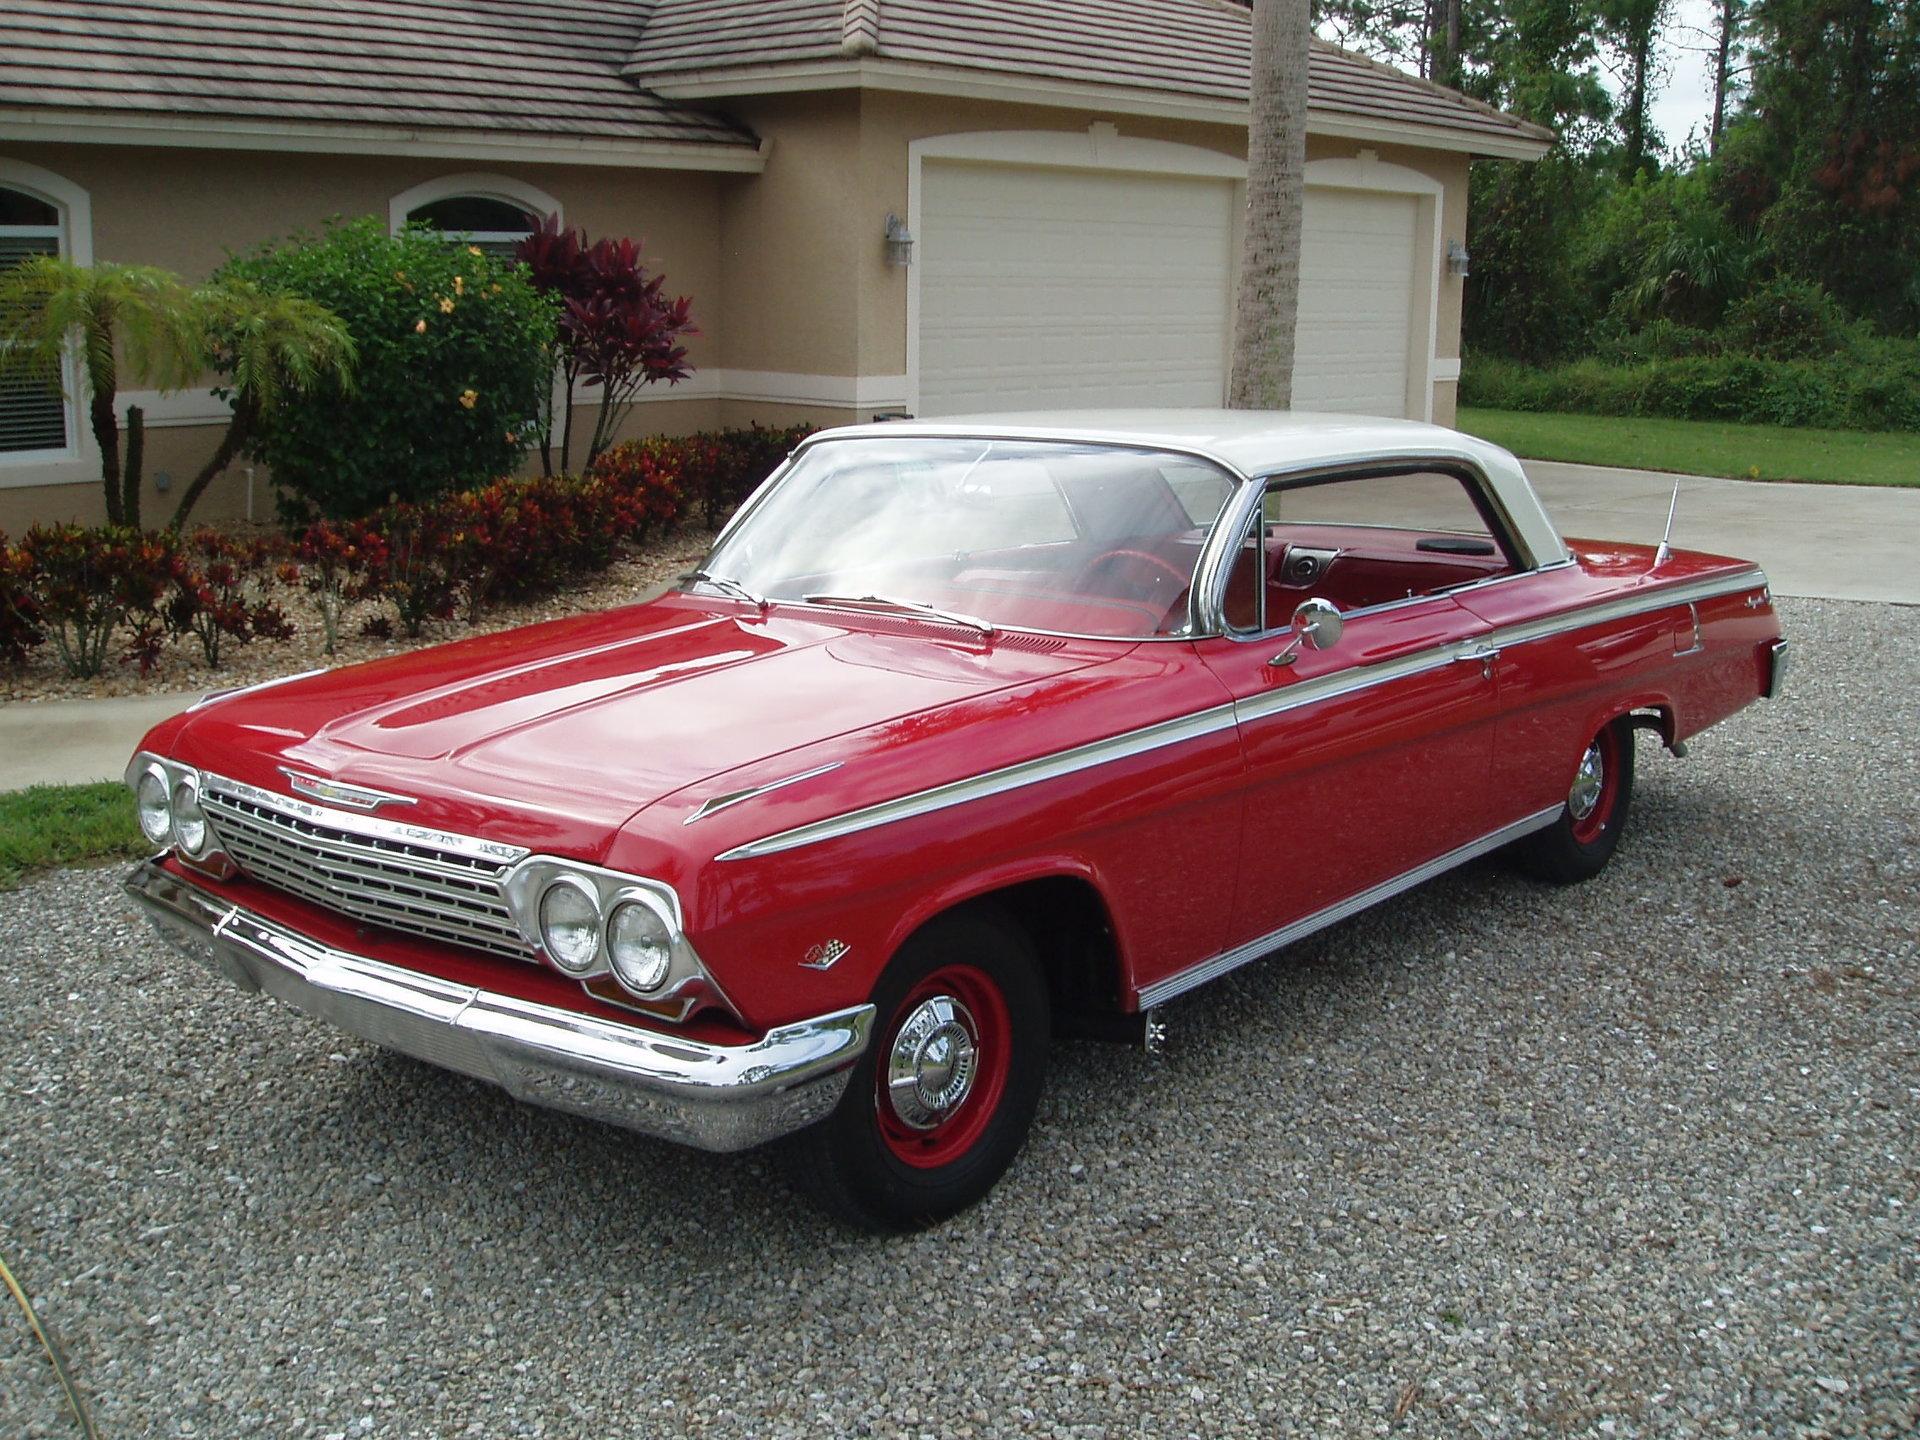 886615016639 hd 1962 chevrolet impala hardtop